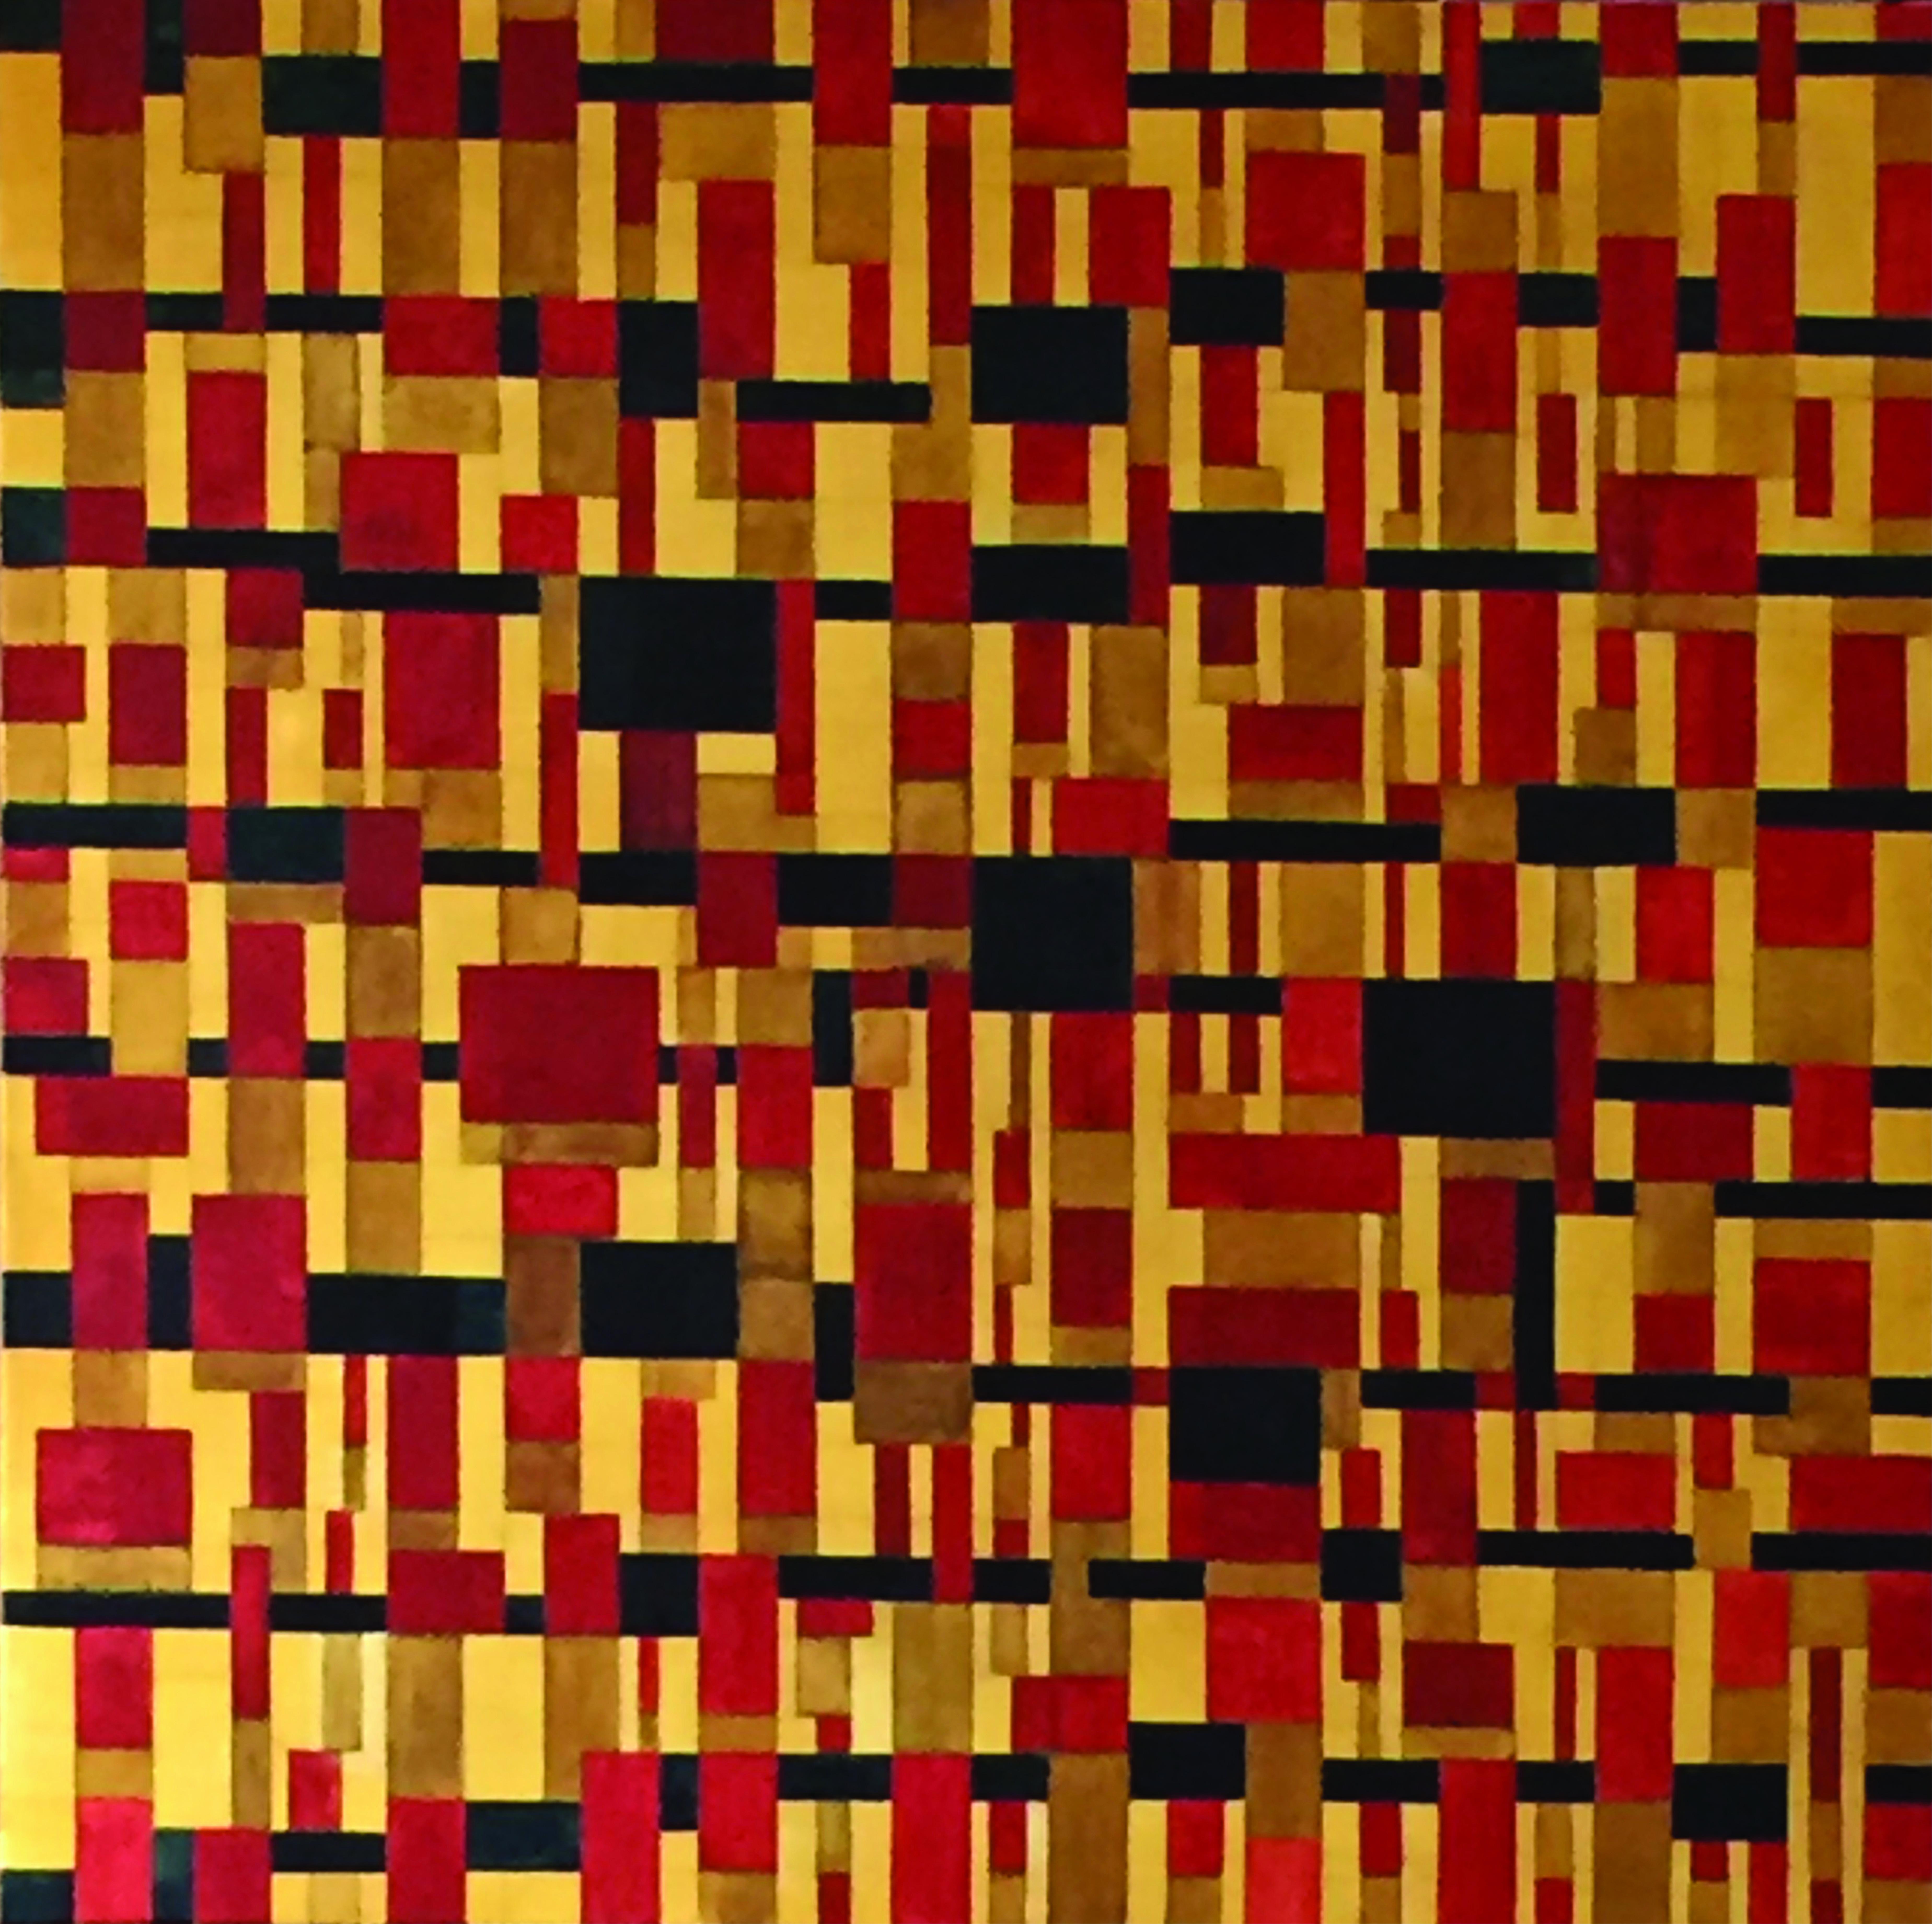 Gold + Rot + Schwarz Kopie